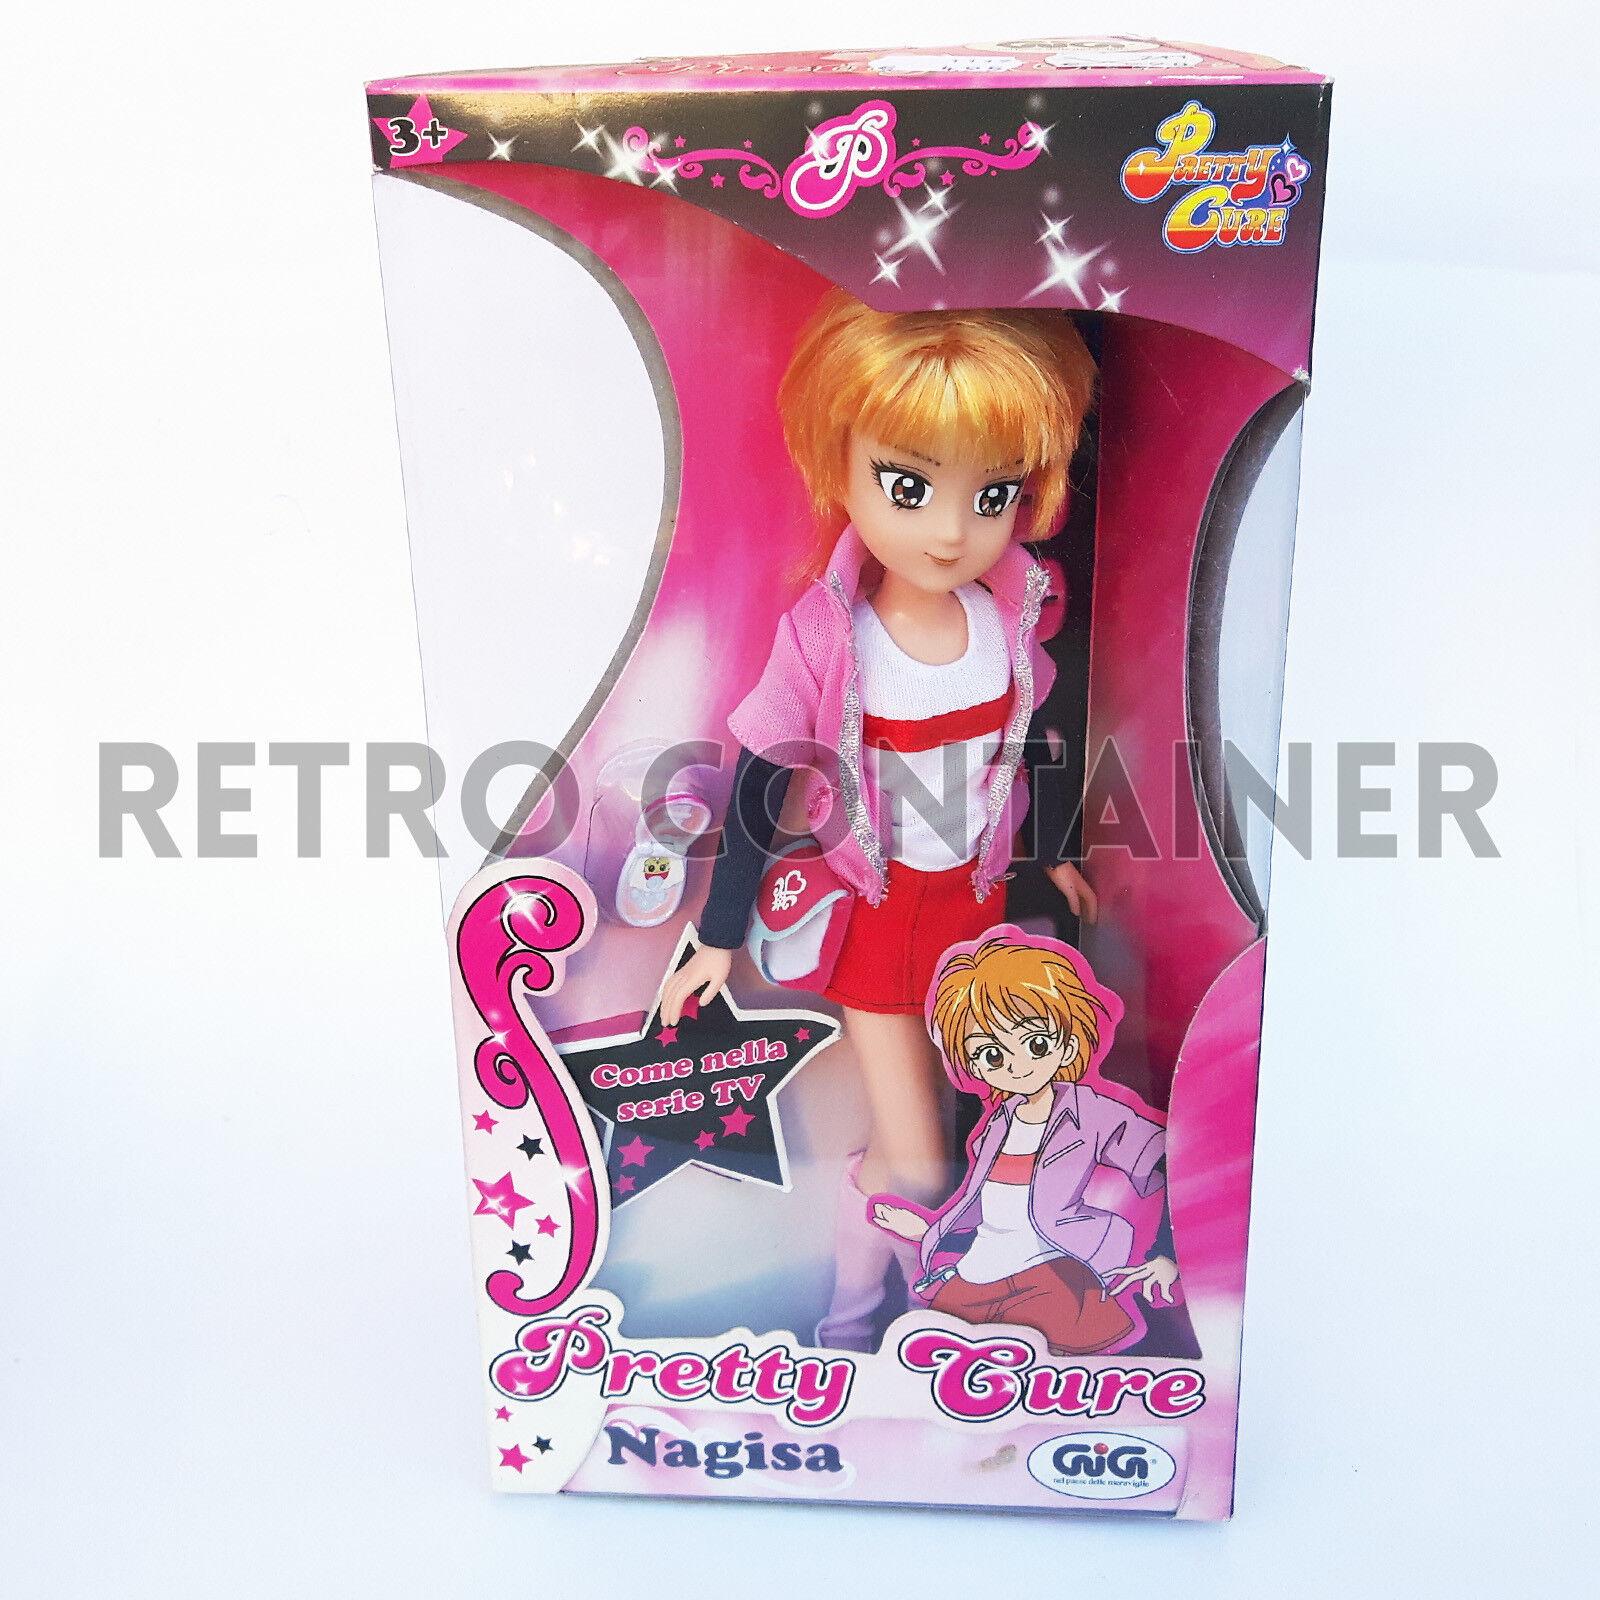 Japan Anime Pretty Cure PreCure PreCure PreCure Cure Nagisa Misumi Natalie Doll Bandai MISB MOC d10aad